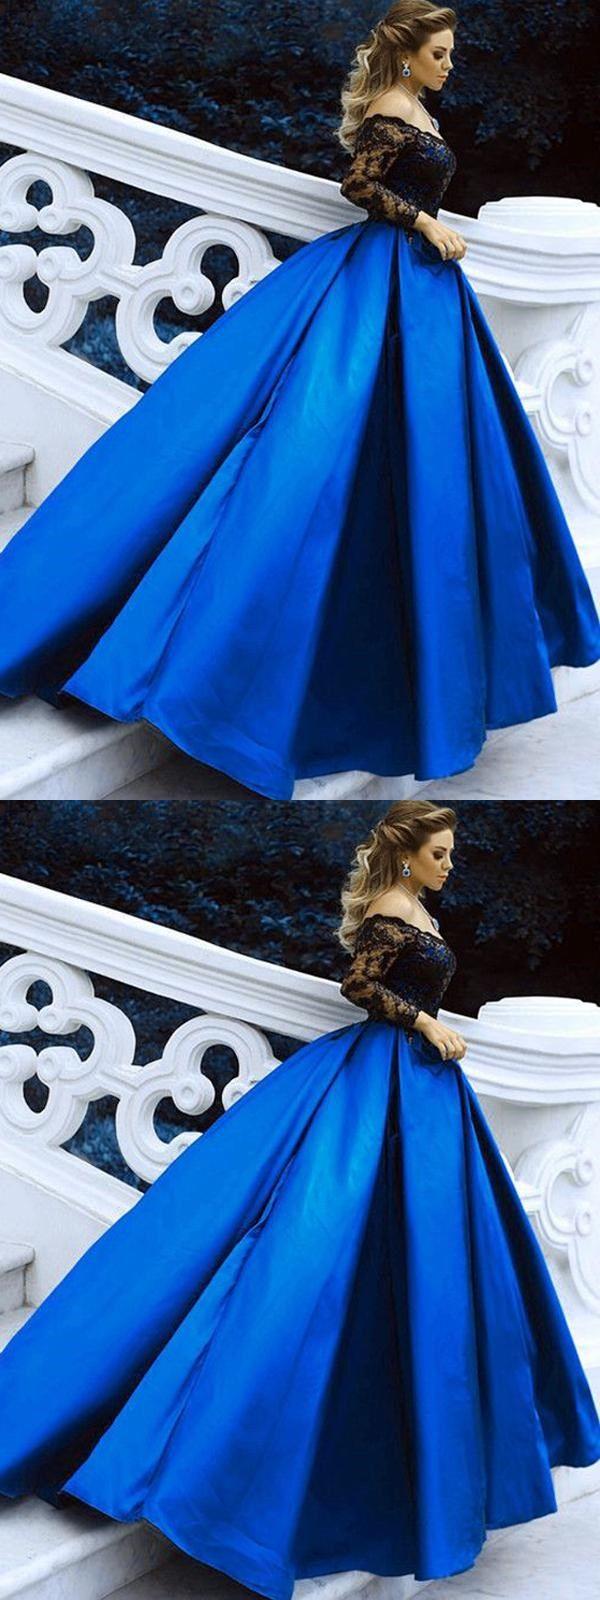 Prom dress aline simple beautiful lace vintage long prom dress